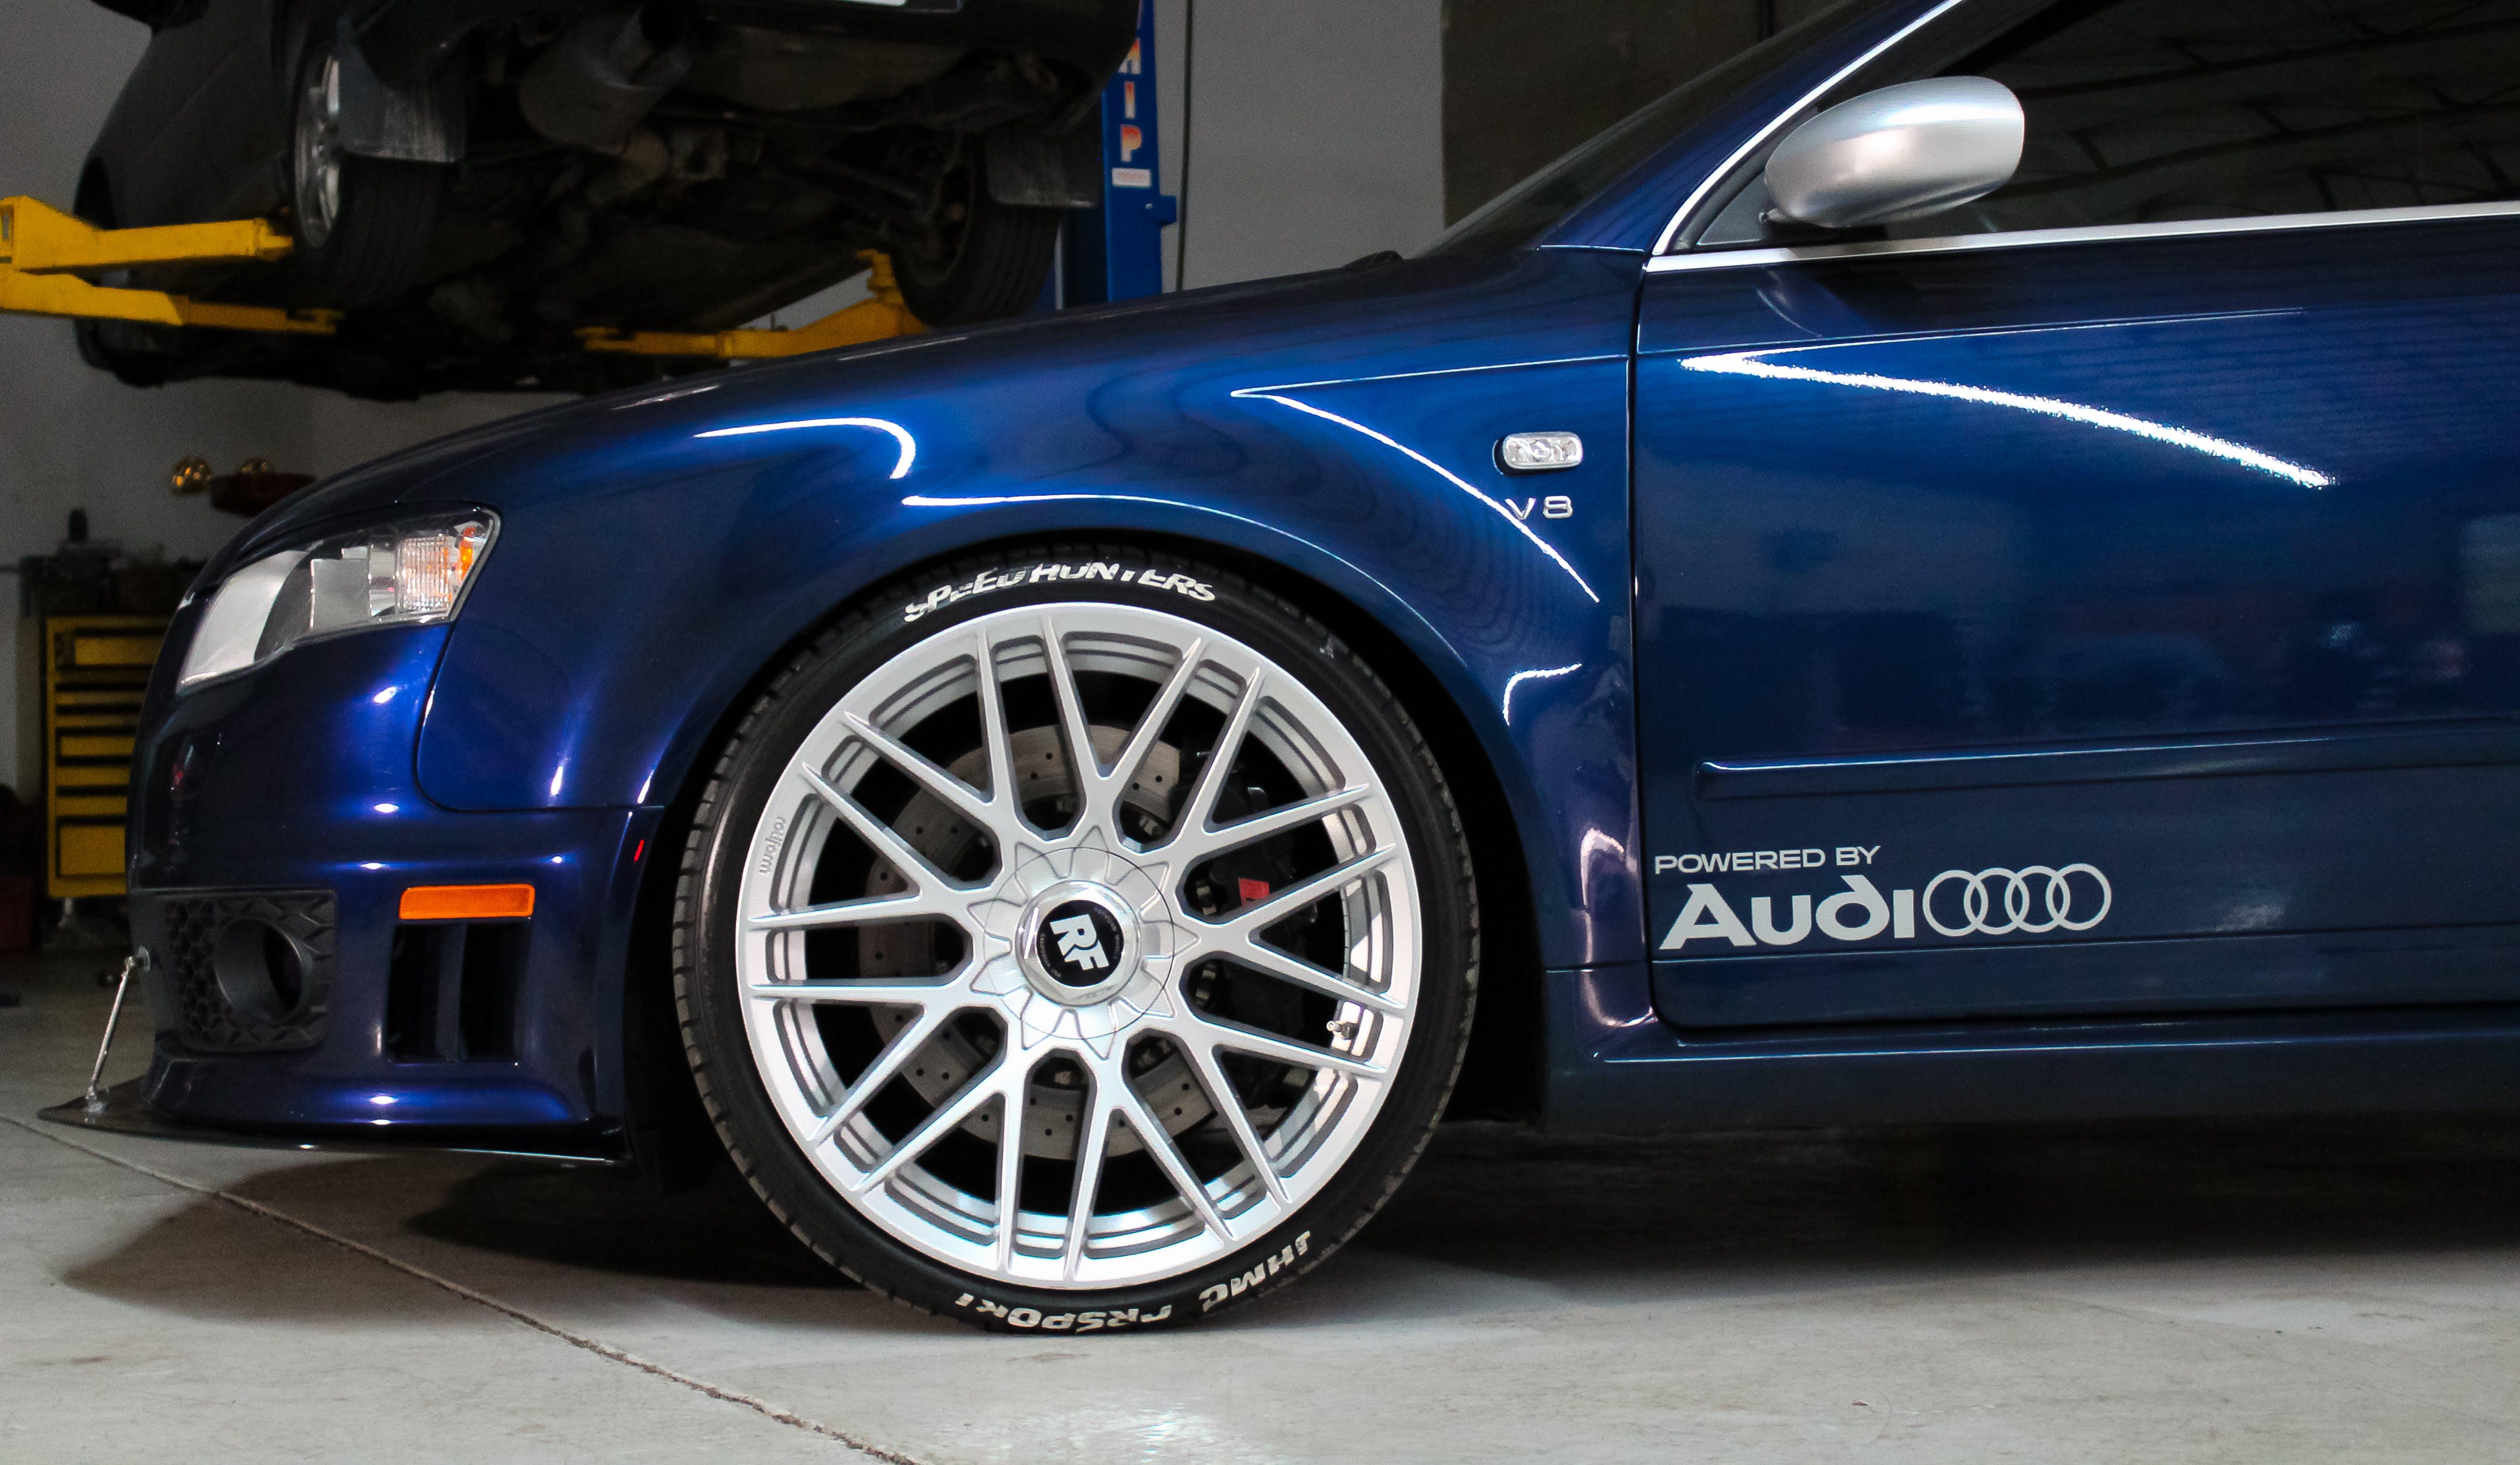 Free stock photo of audi car automotive wheel tire brake v8 repair